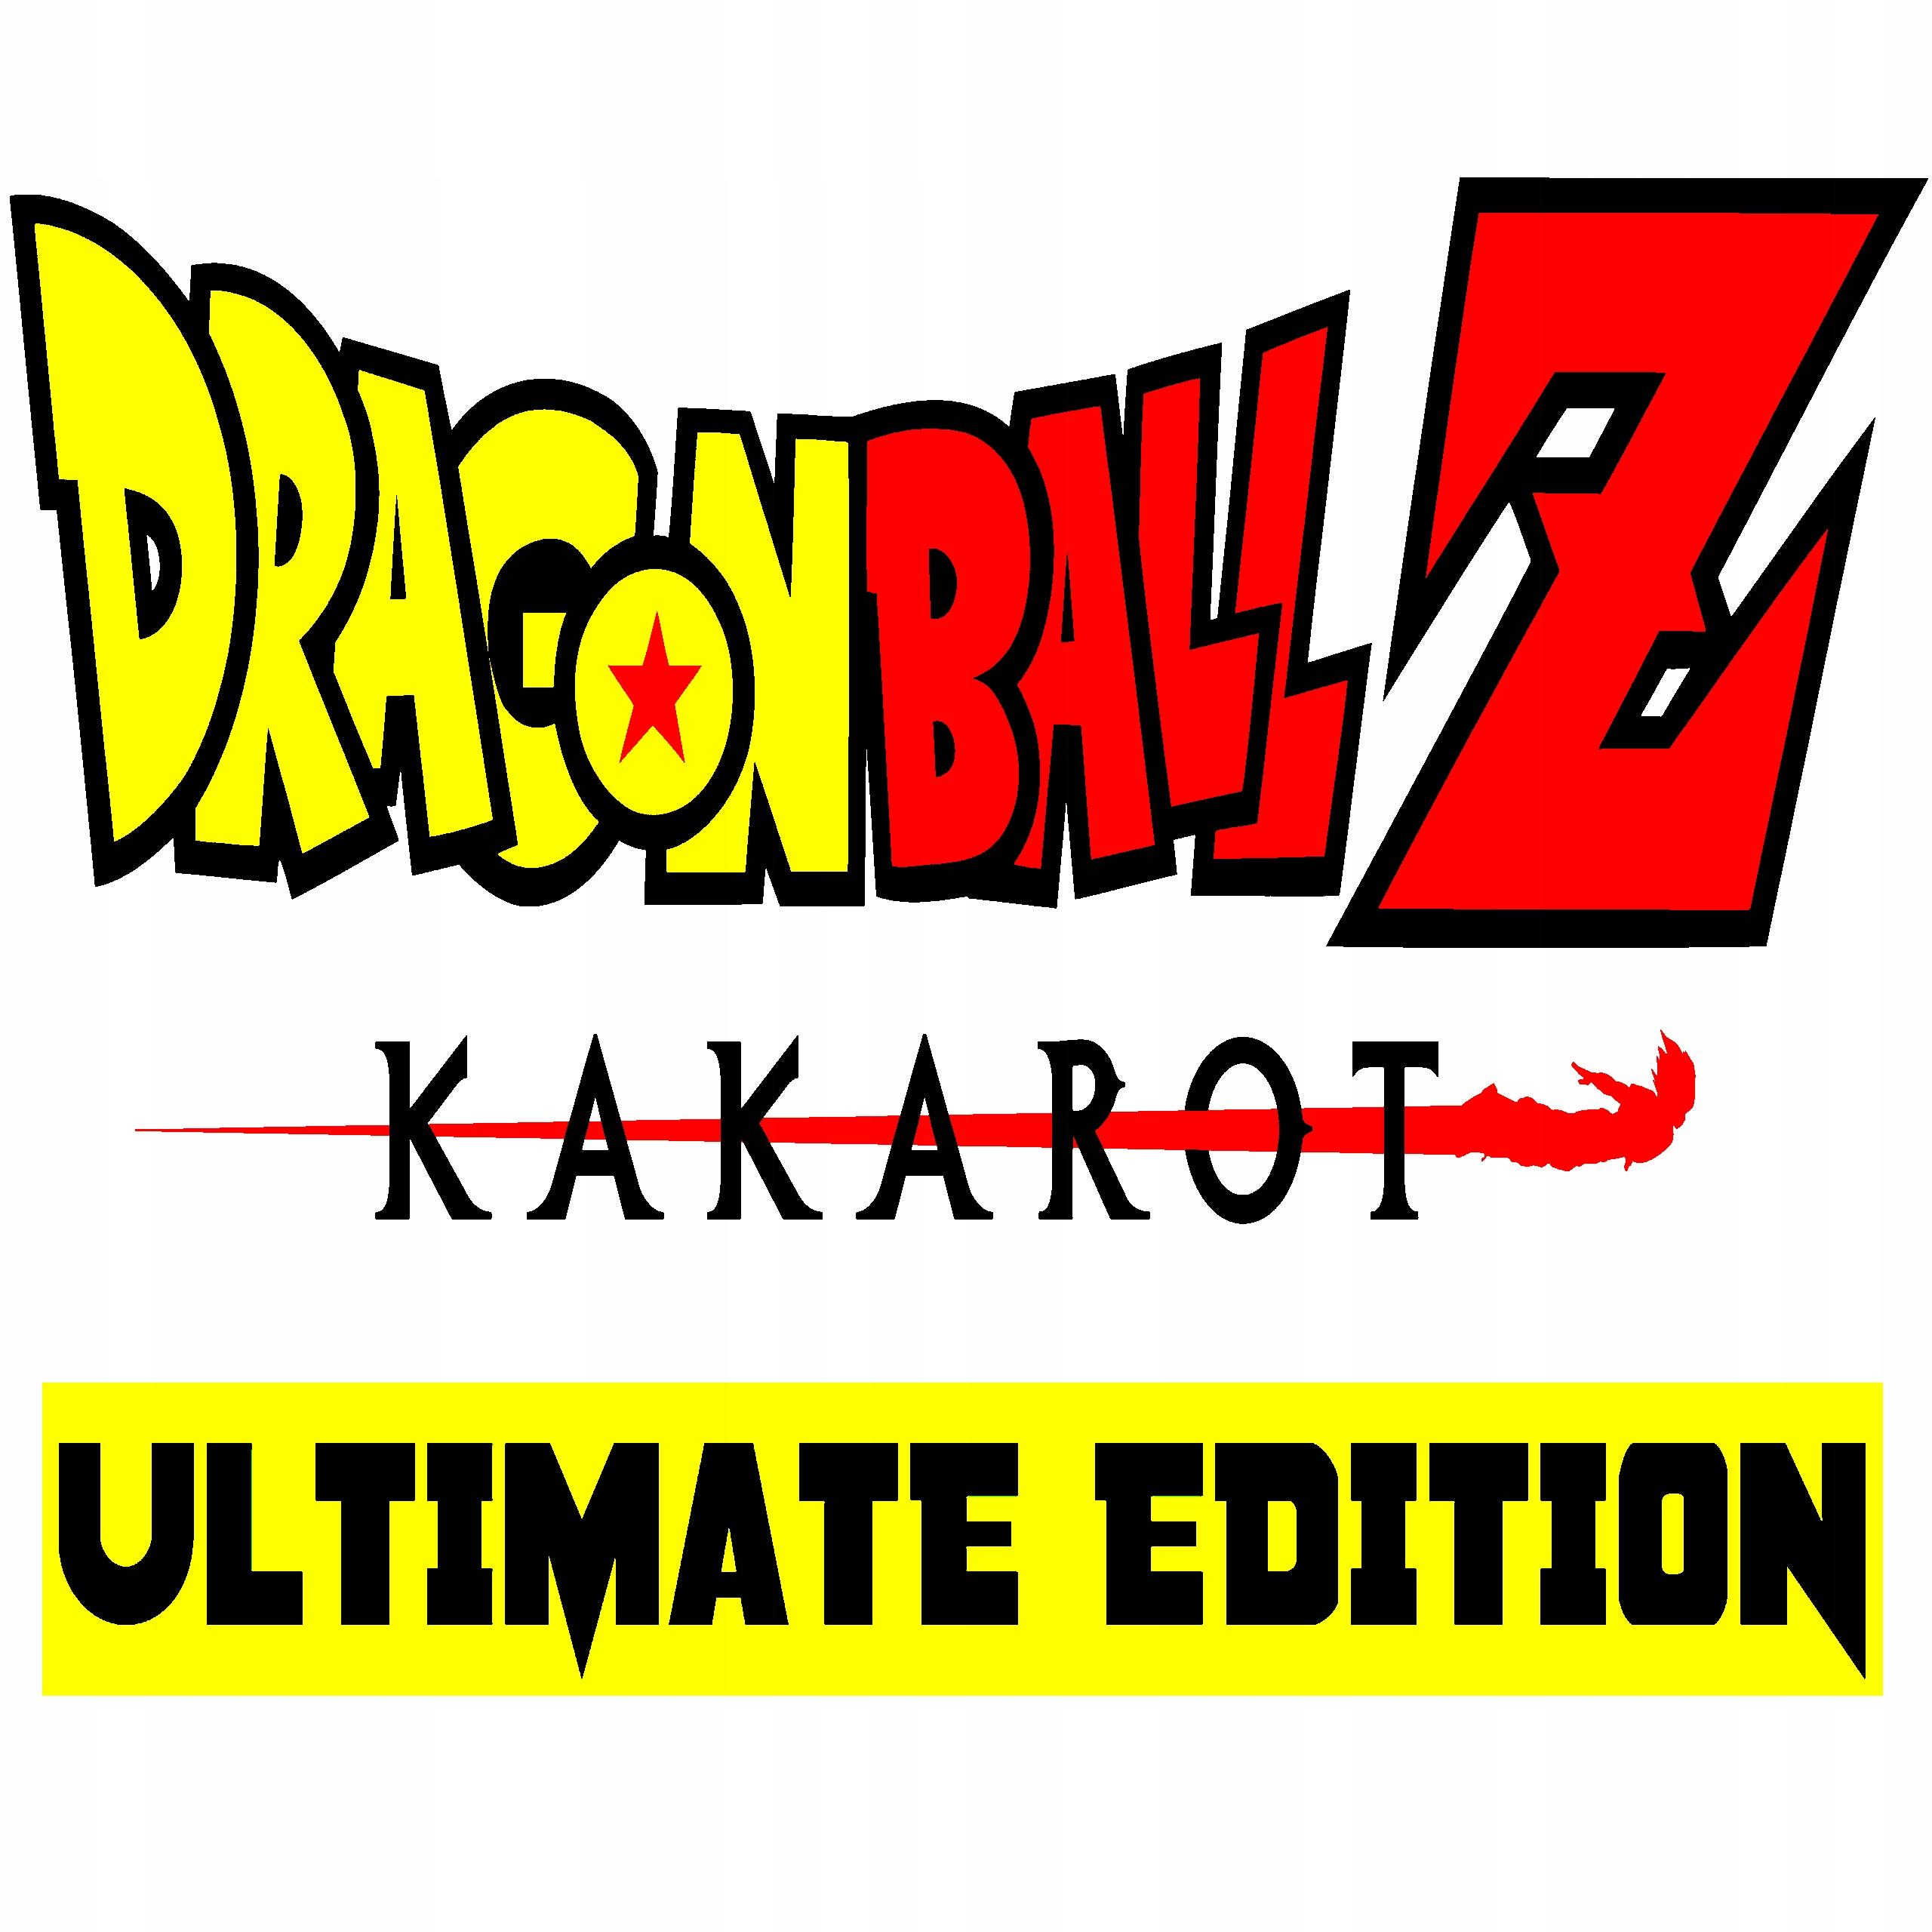 Item DRAGON BALL Z: KAKAROT Ultimate Edition VIP ACCOUNT